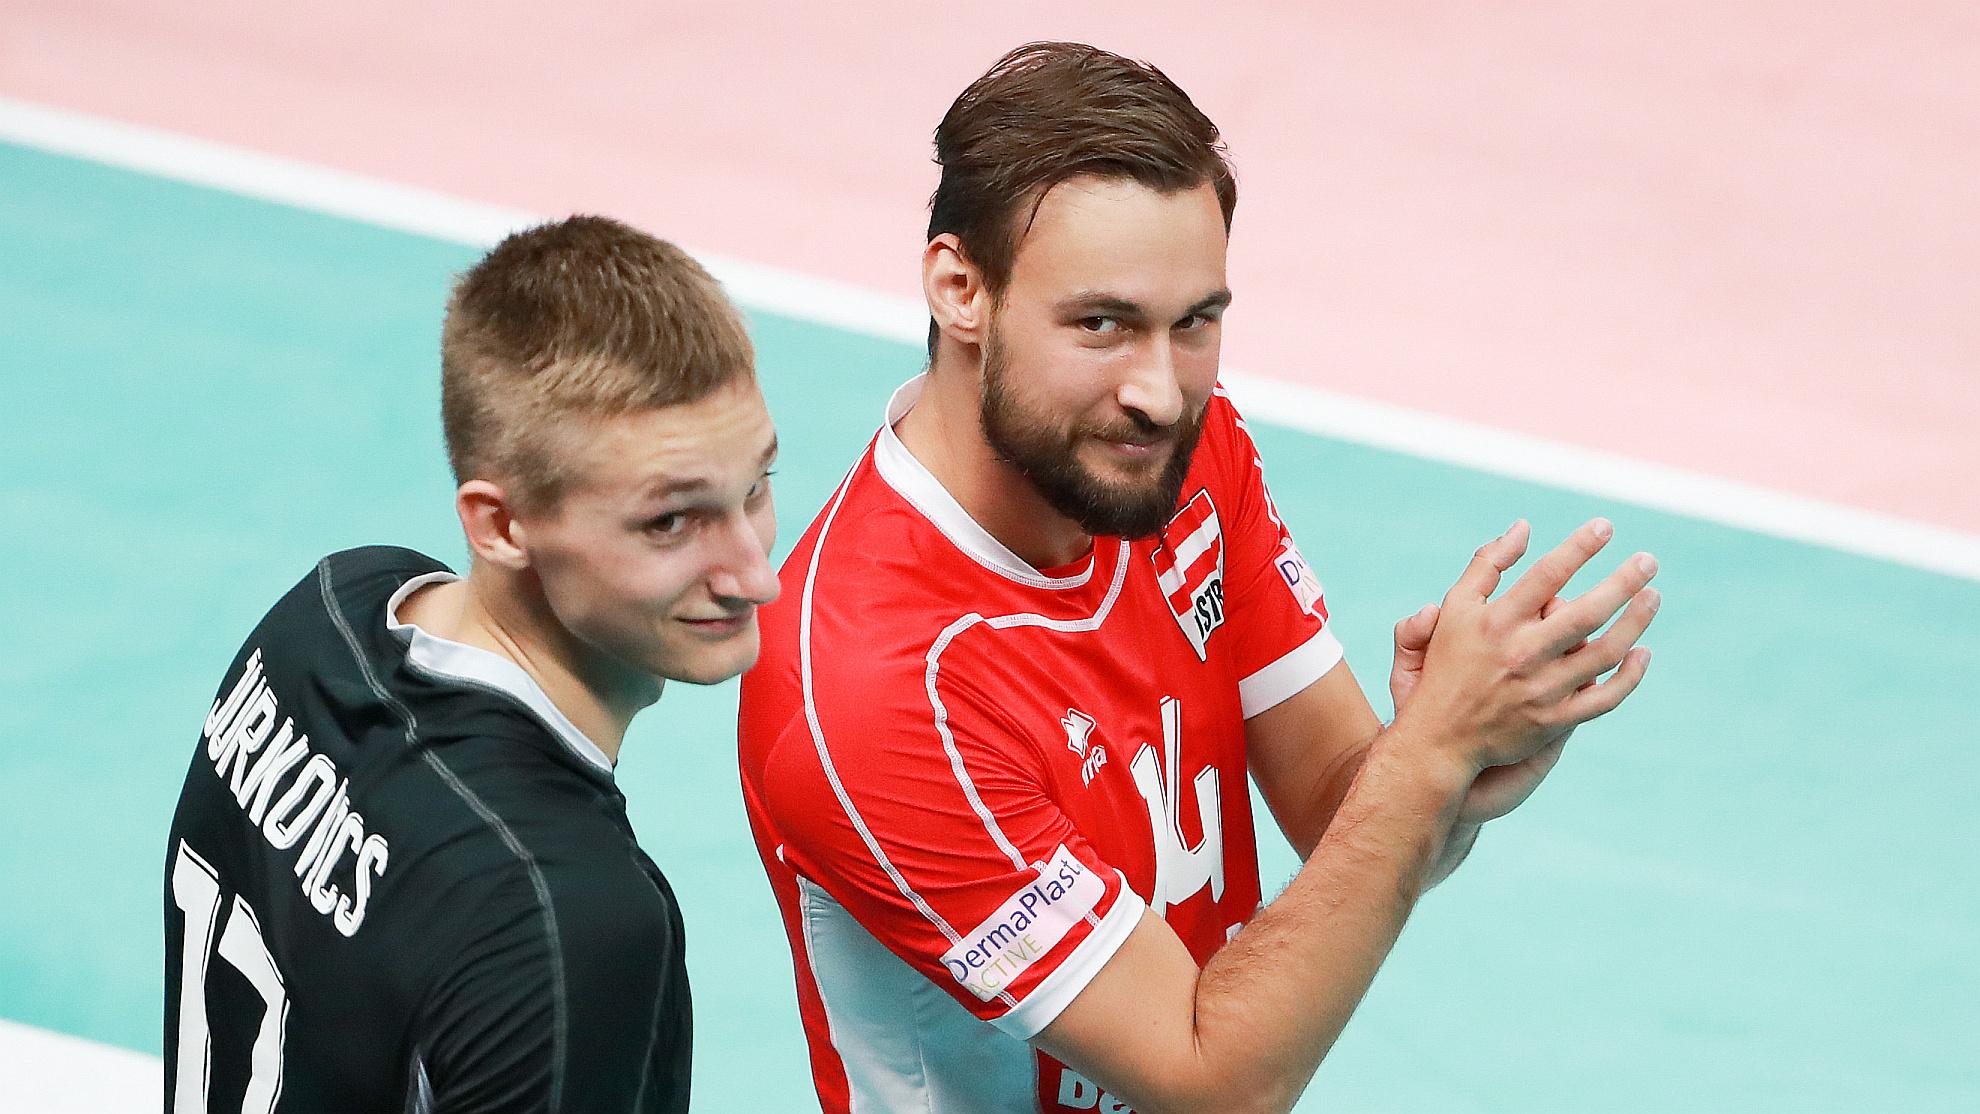 Mathäus Jurkovics mit Florian Ringseis bei der EuroVolley 2019 - FOTO © GEPA pictures/Andreas Pranter